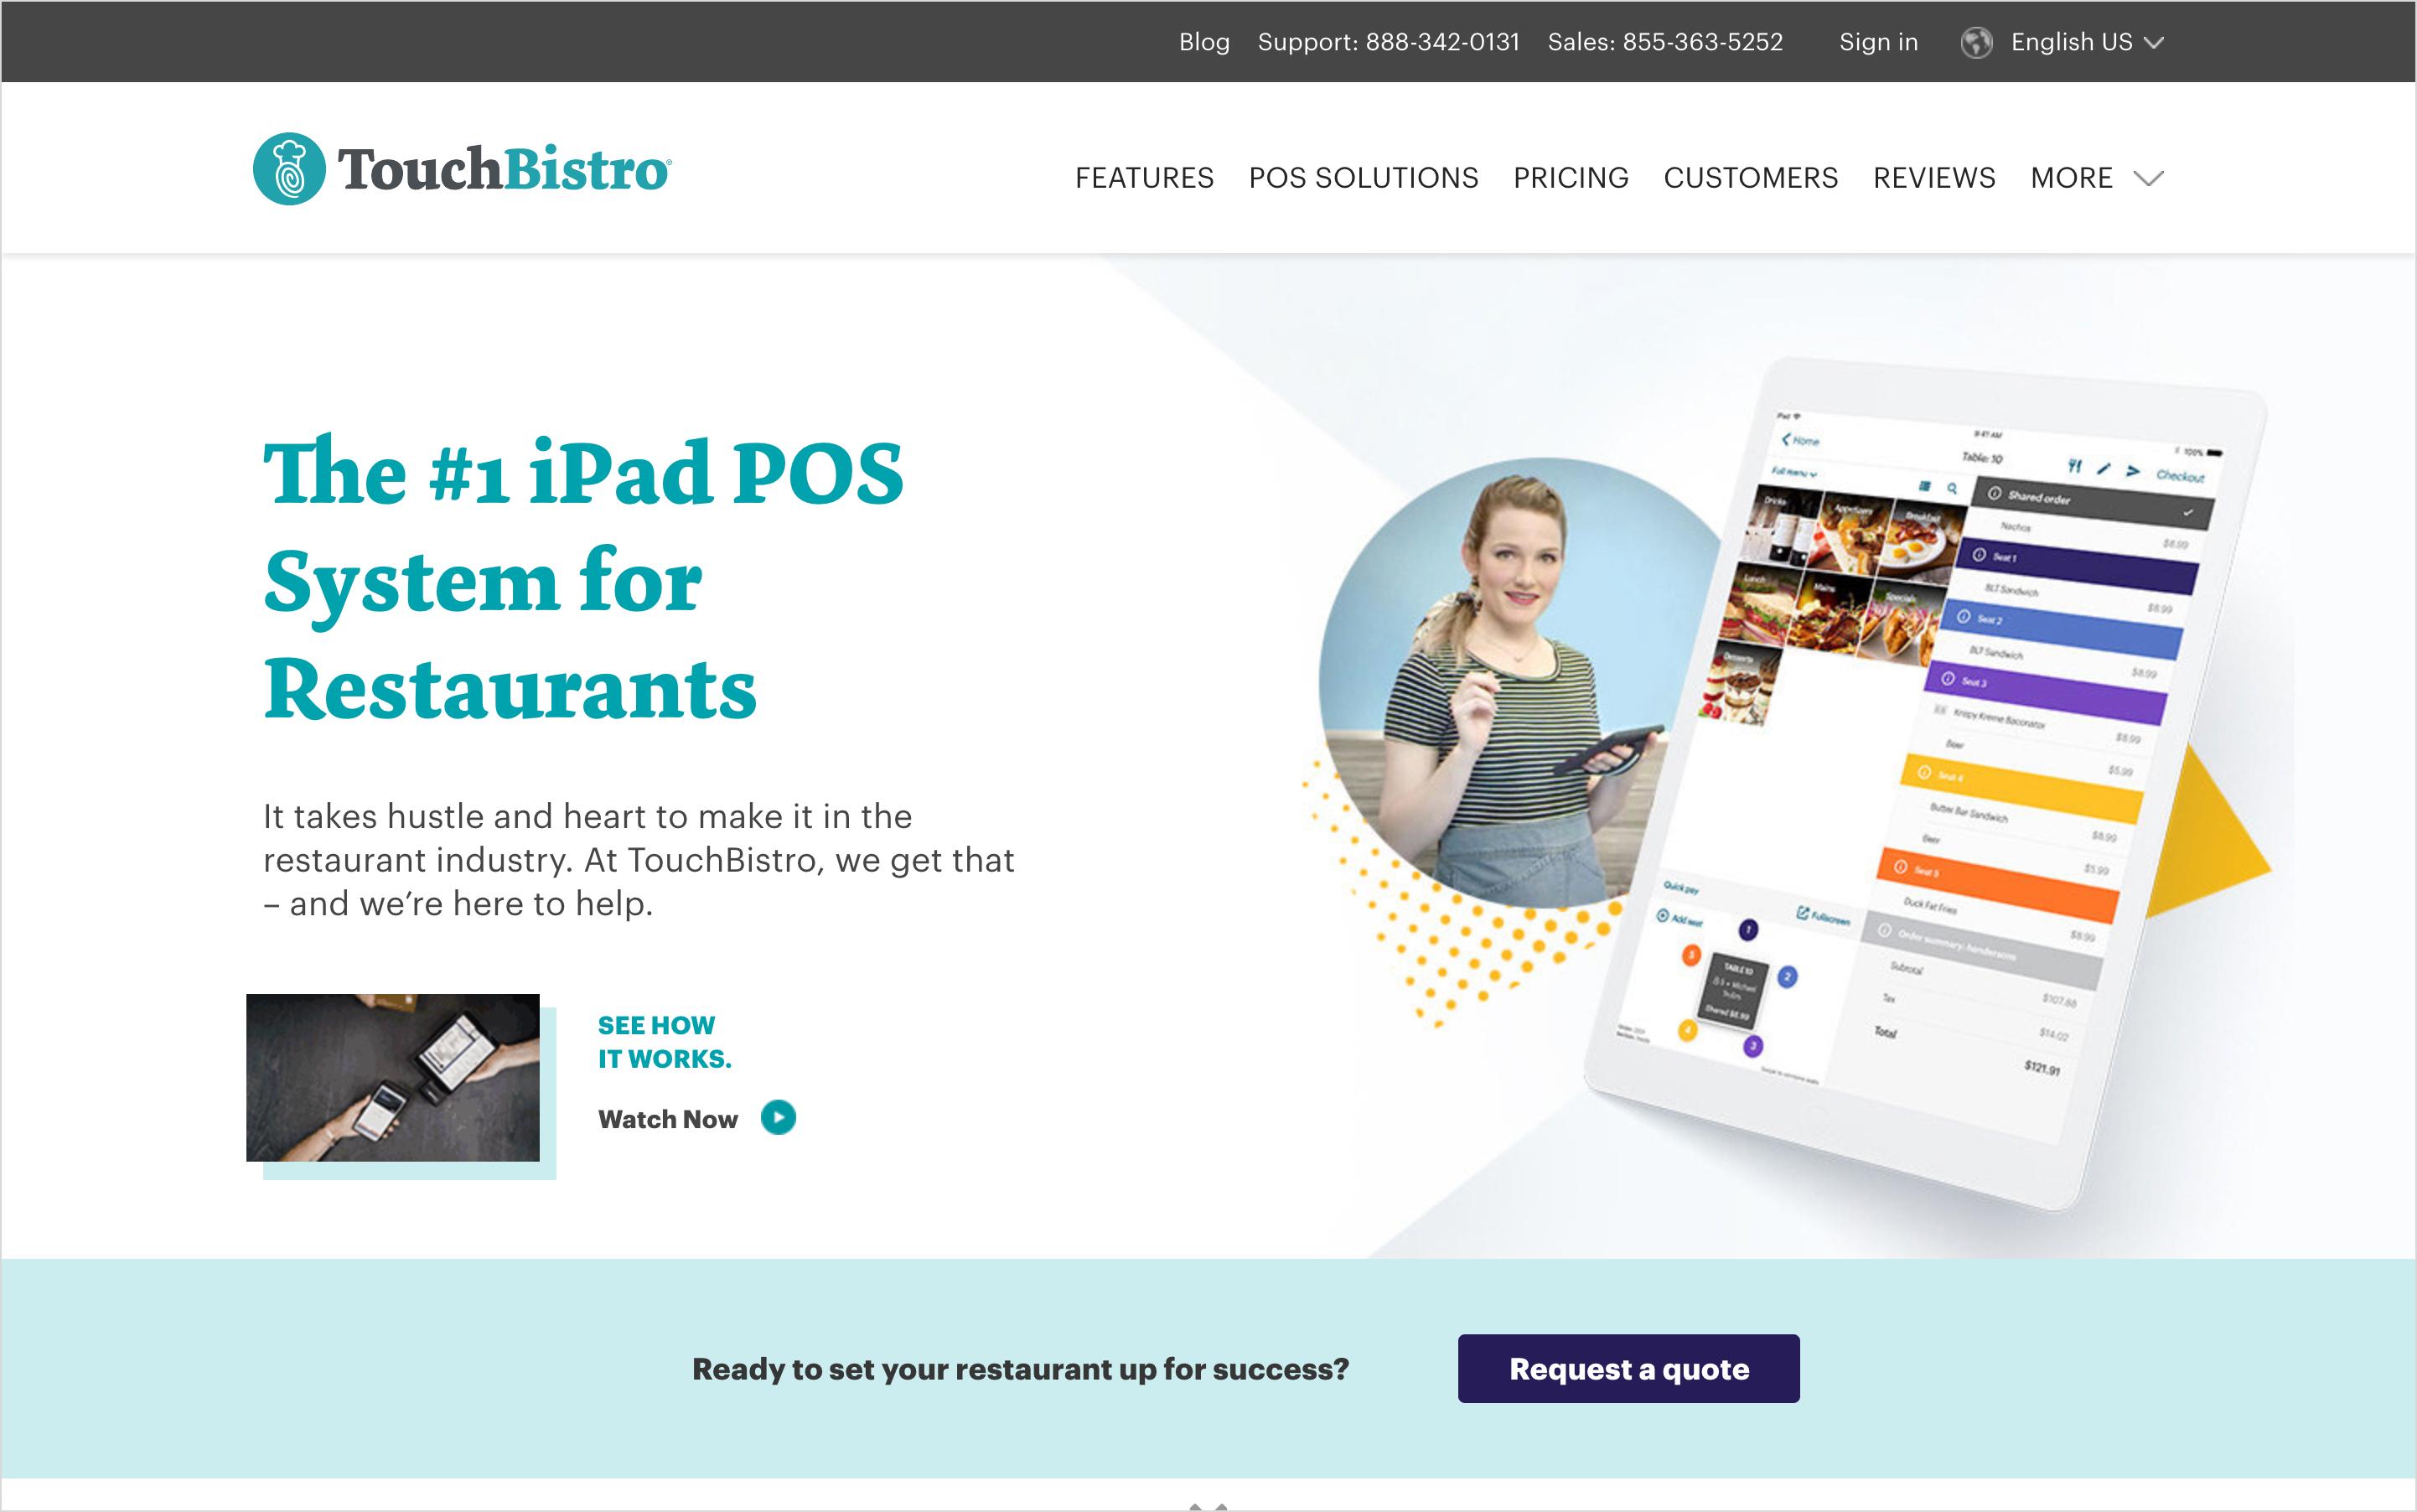 touchbistro homepage